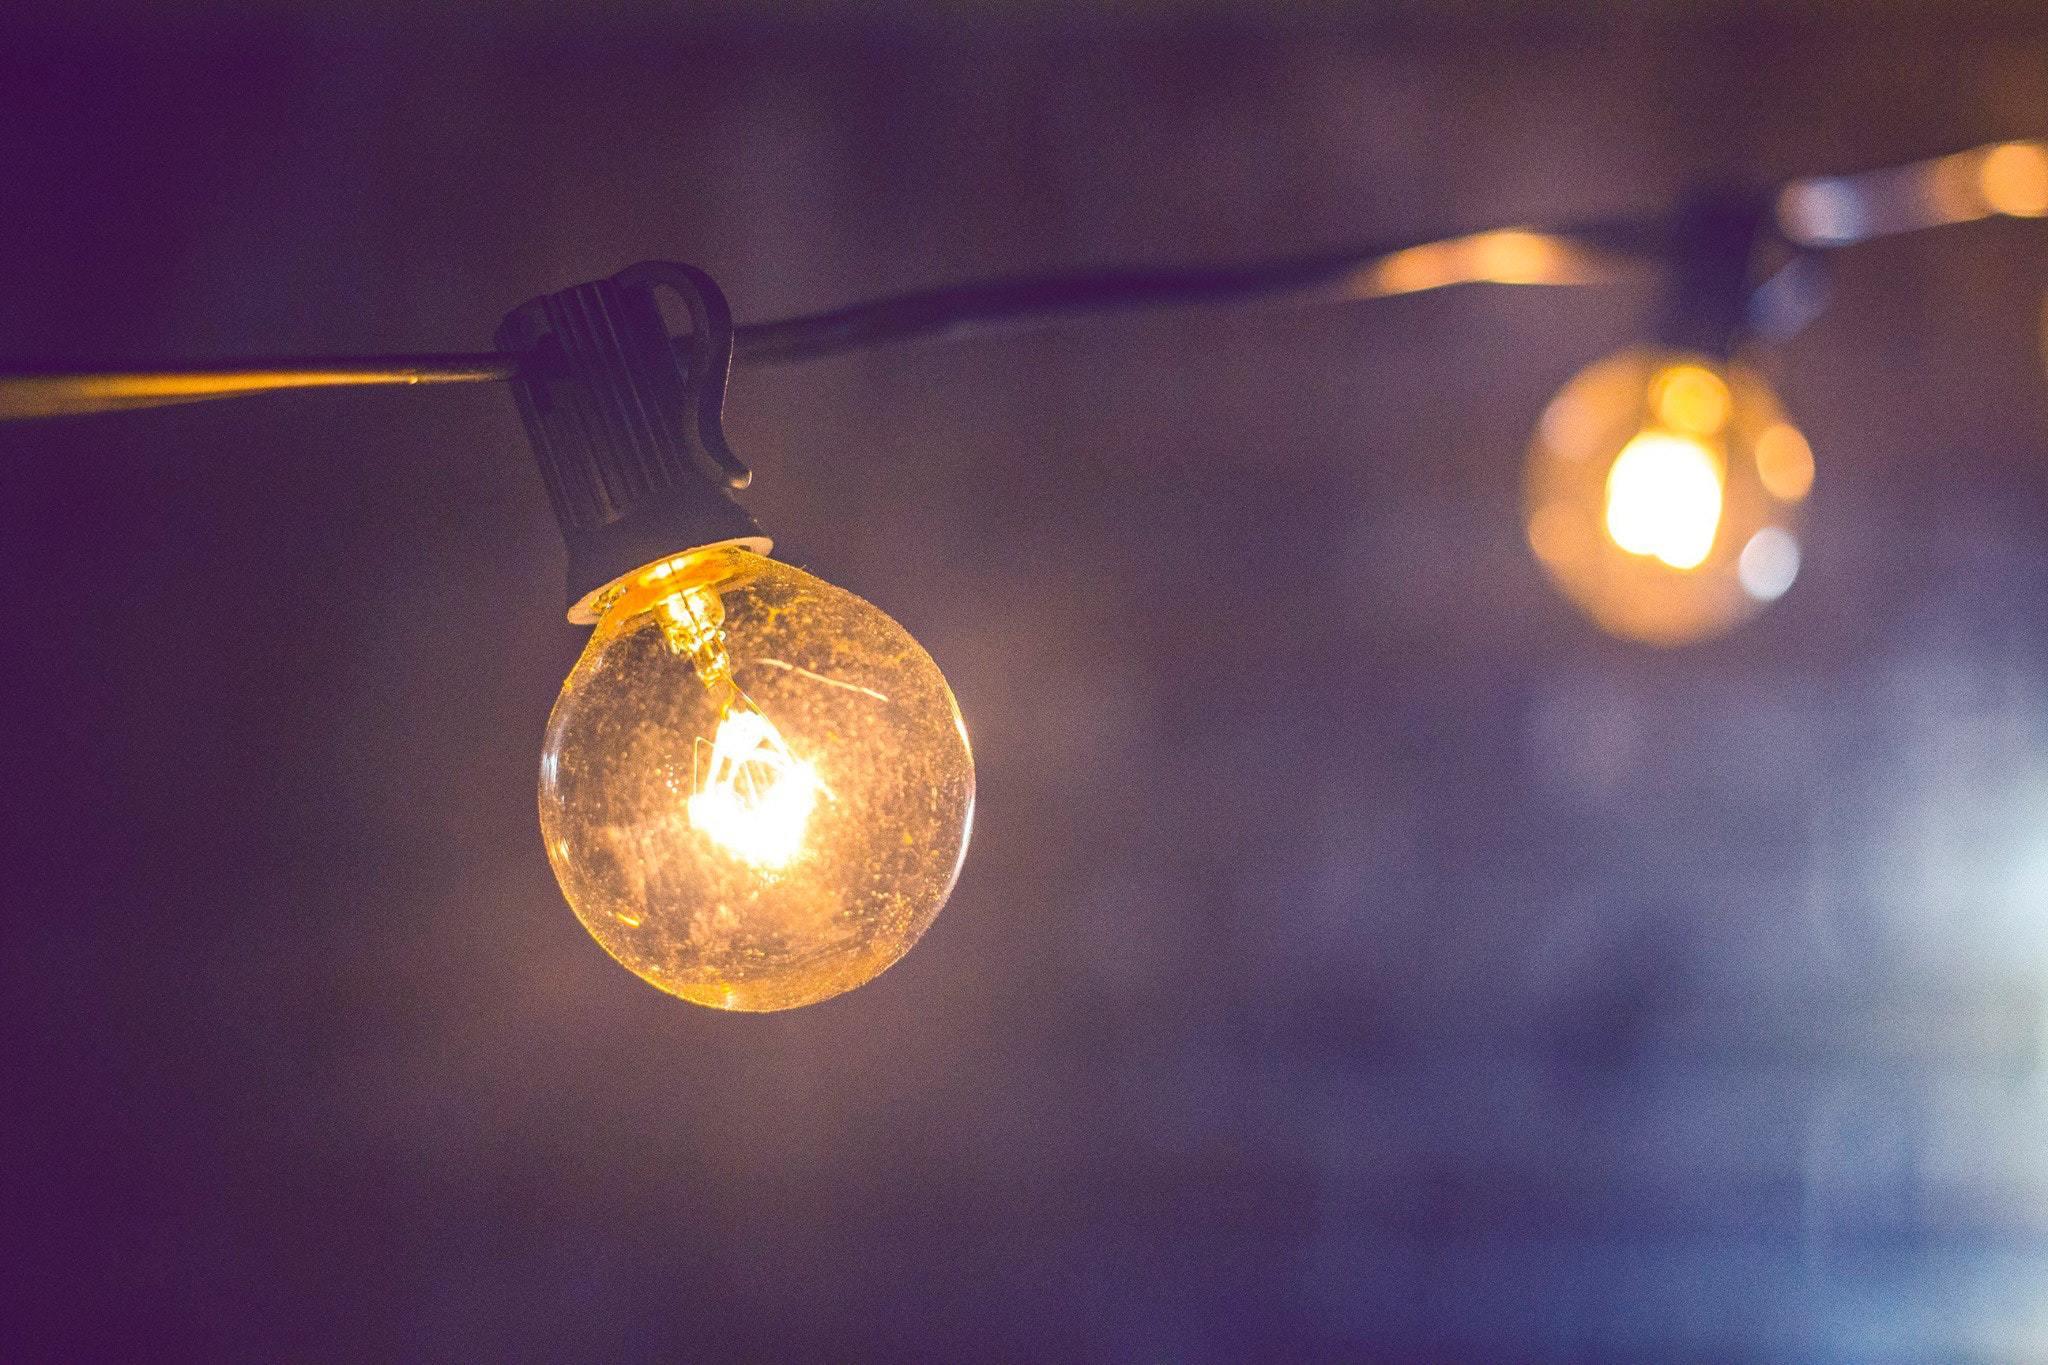 Two bare lightbulbs glowing in the dark